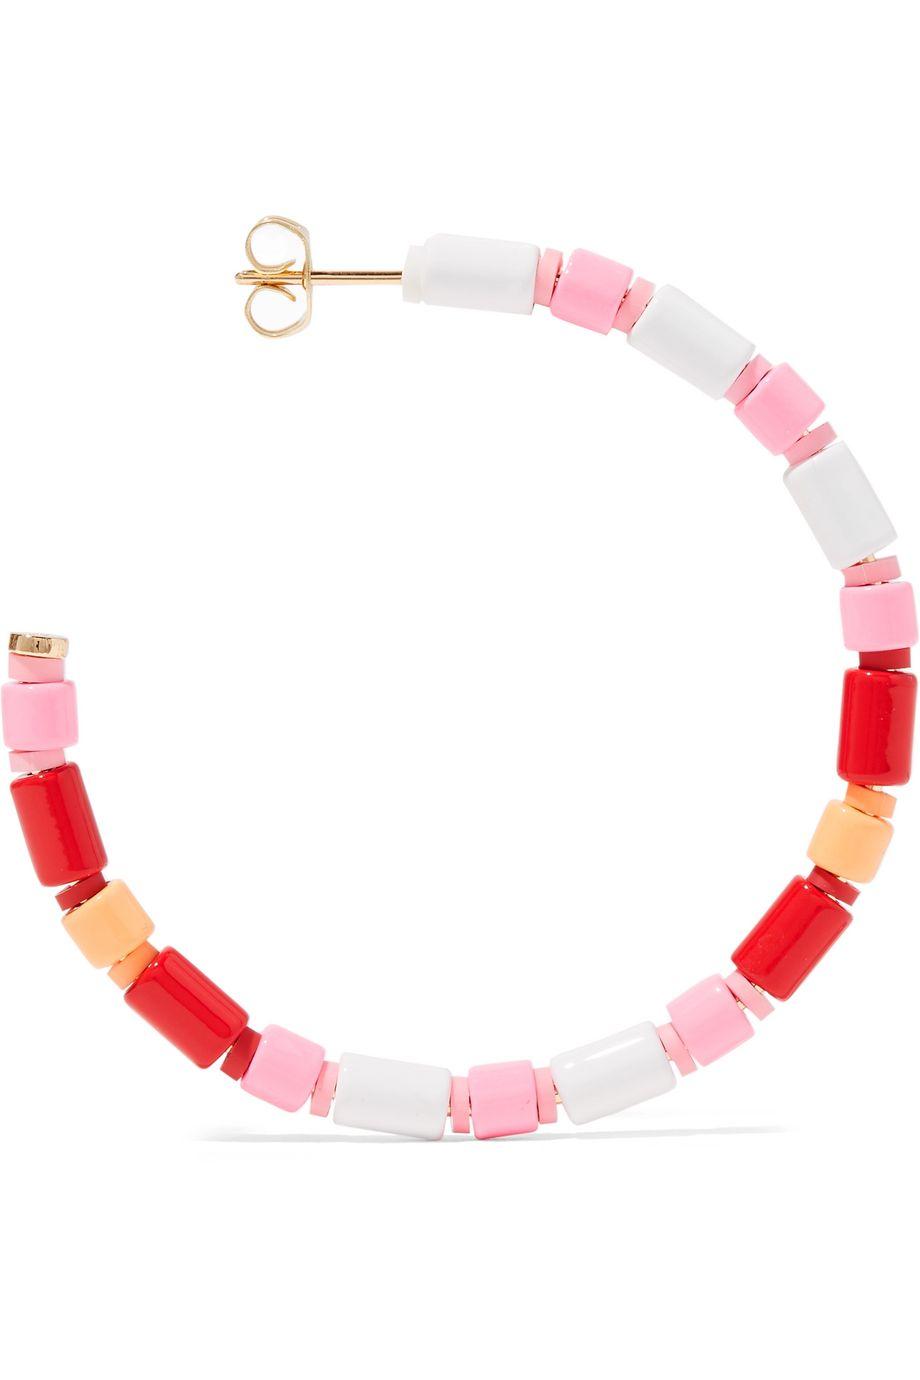 Roxanne Assoulin U-Tube enamel hoop earrings